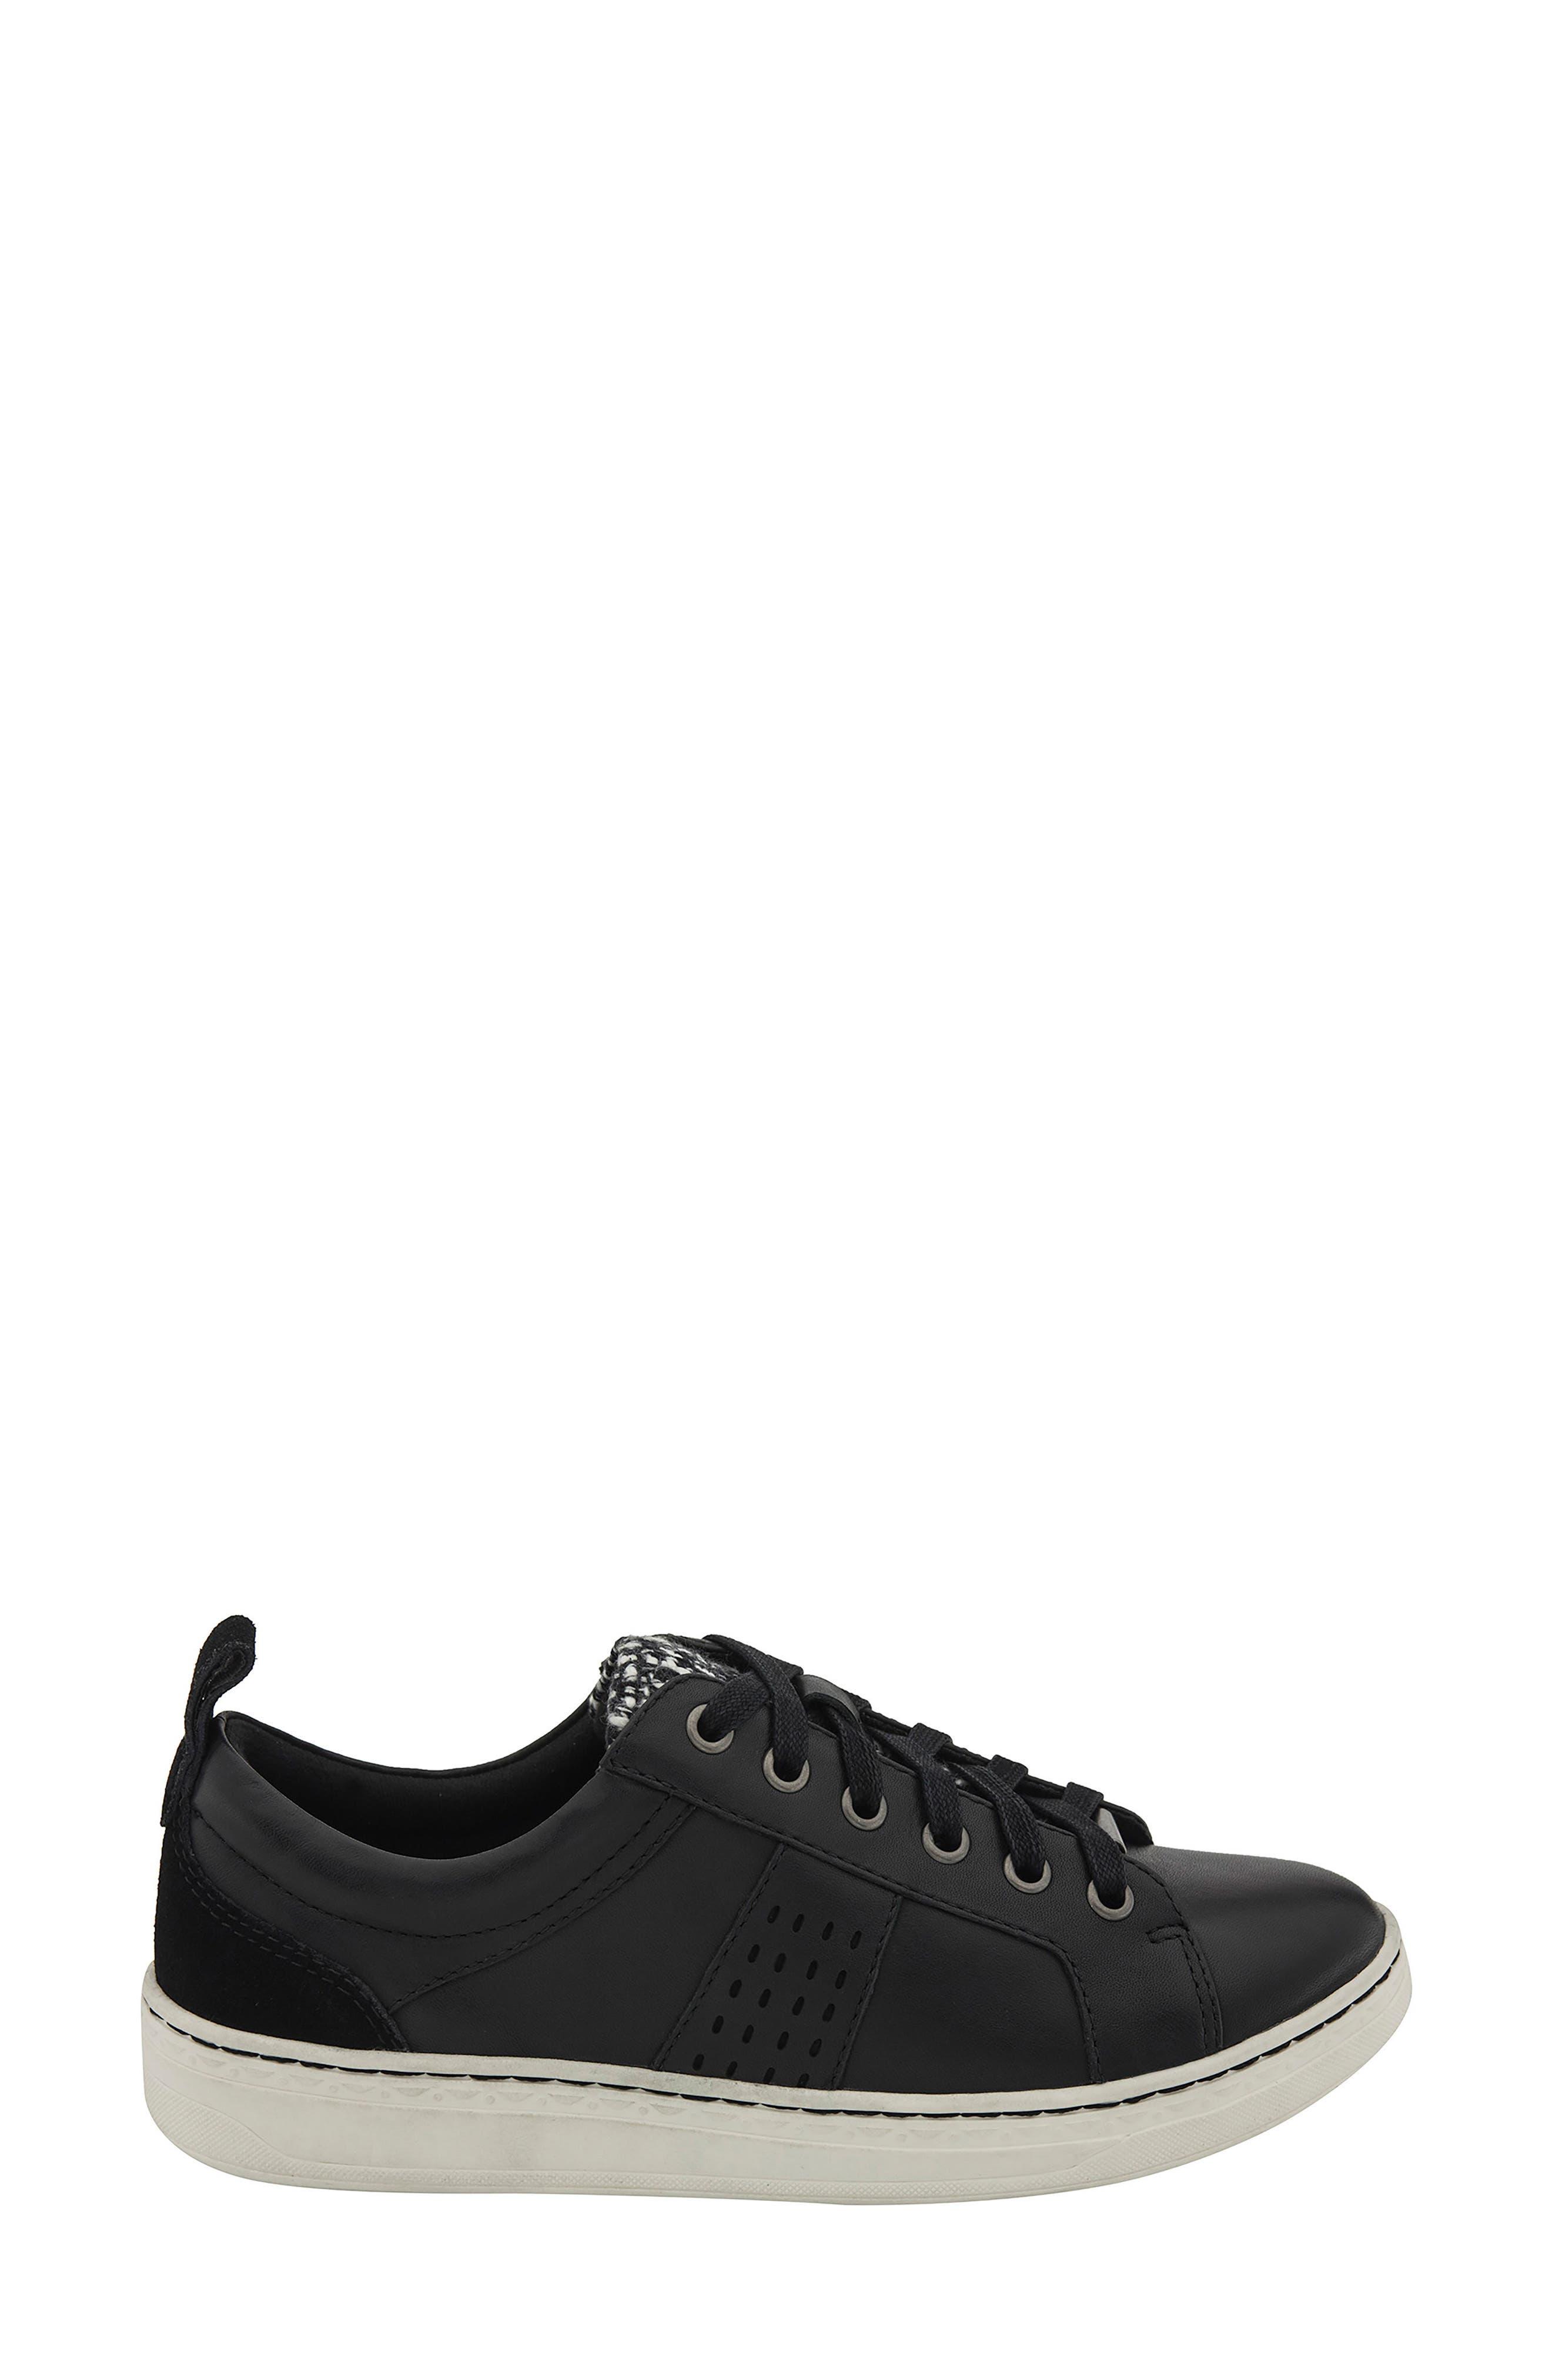 Zag Sneaker,                             Alternate thumbnail 19, color,